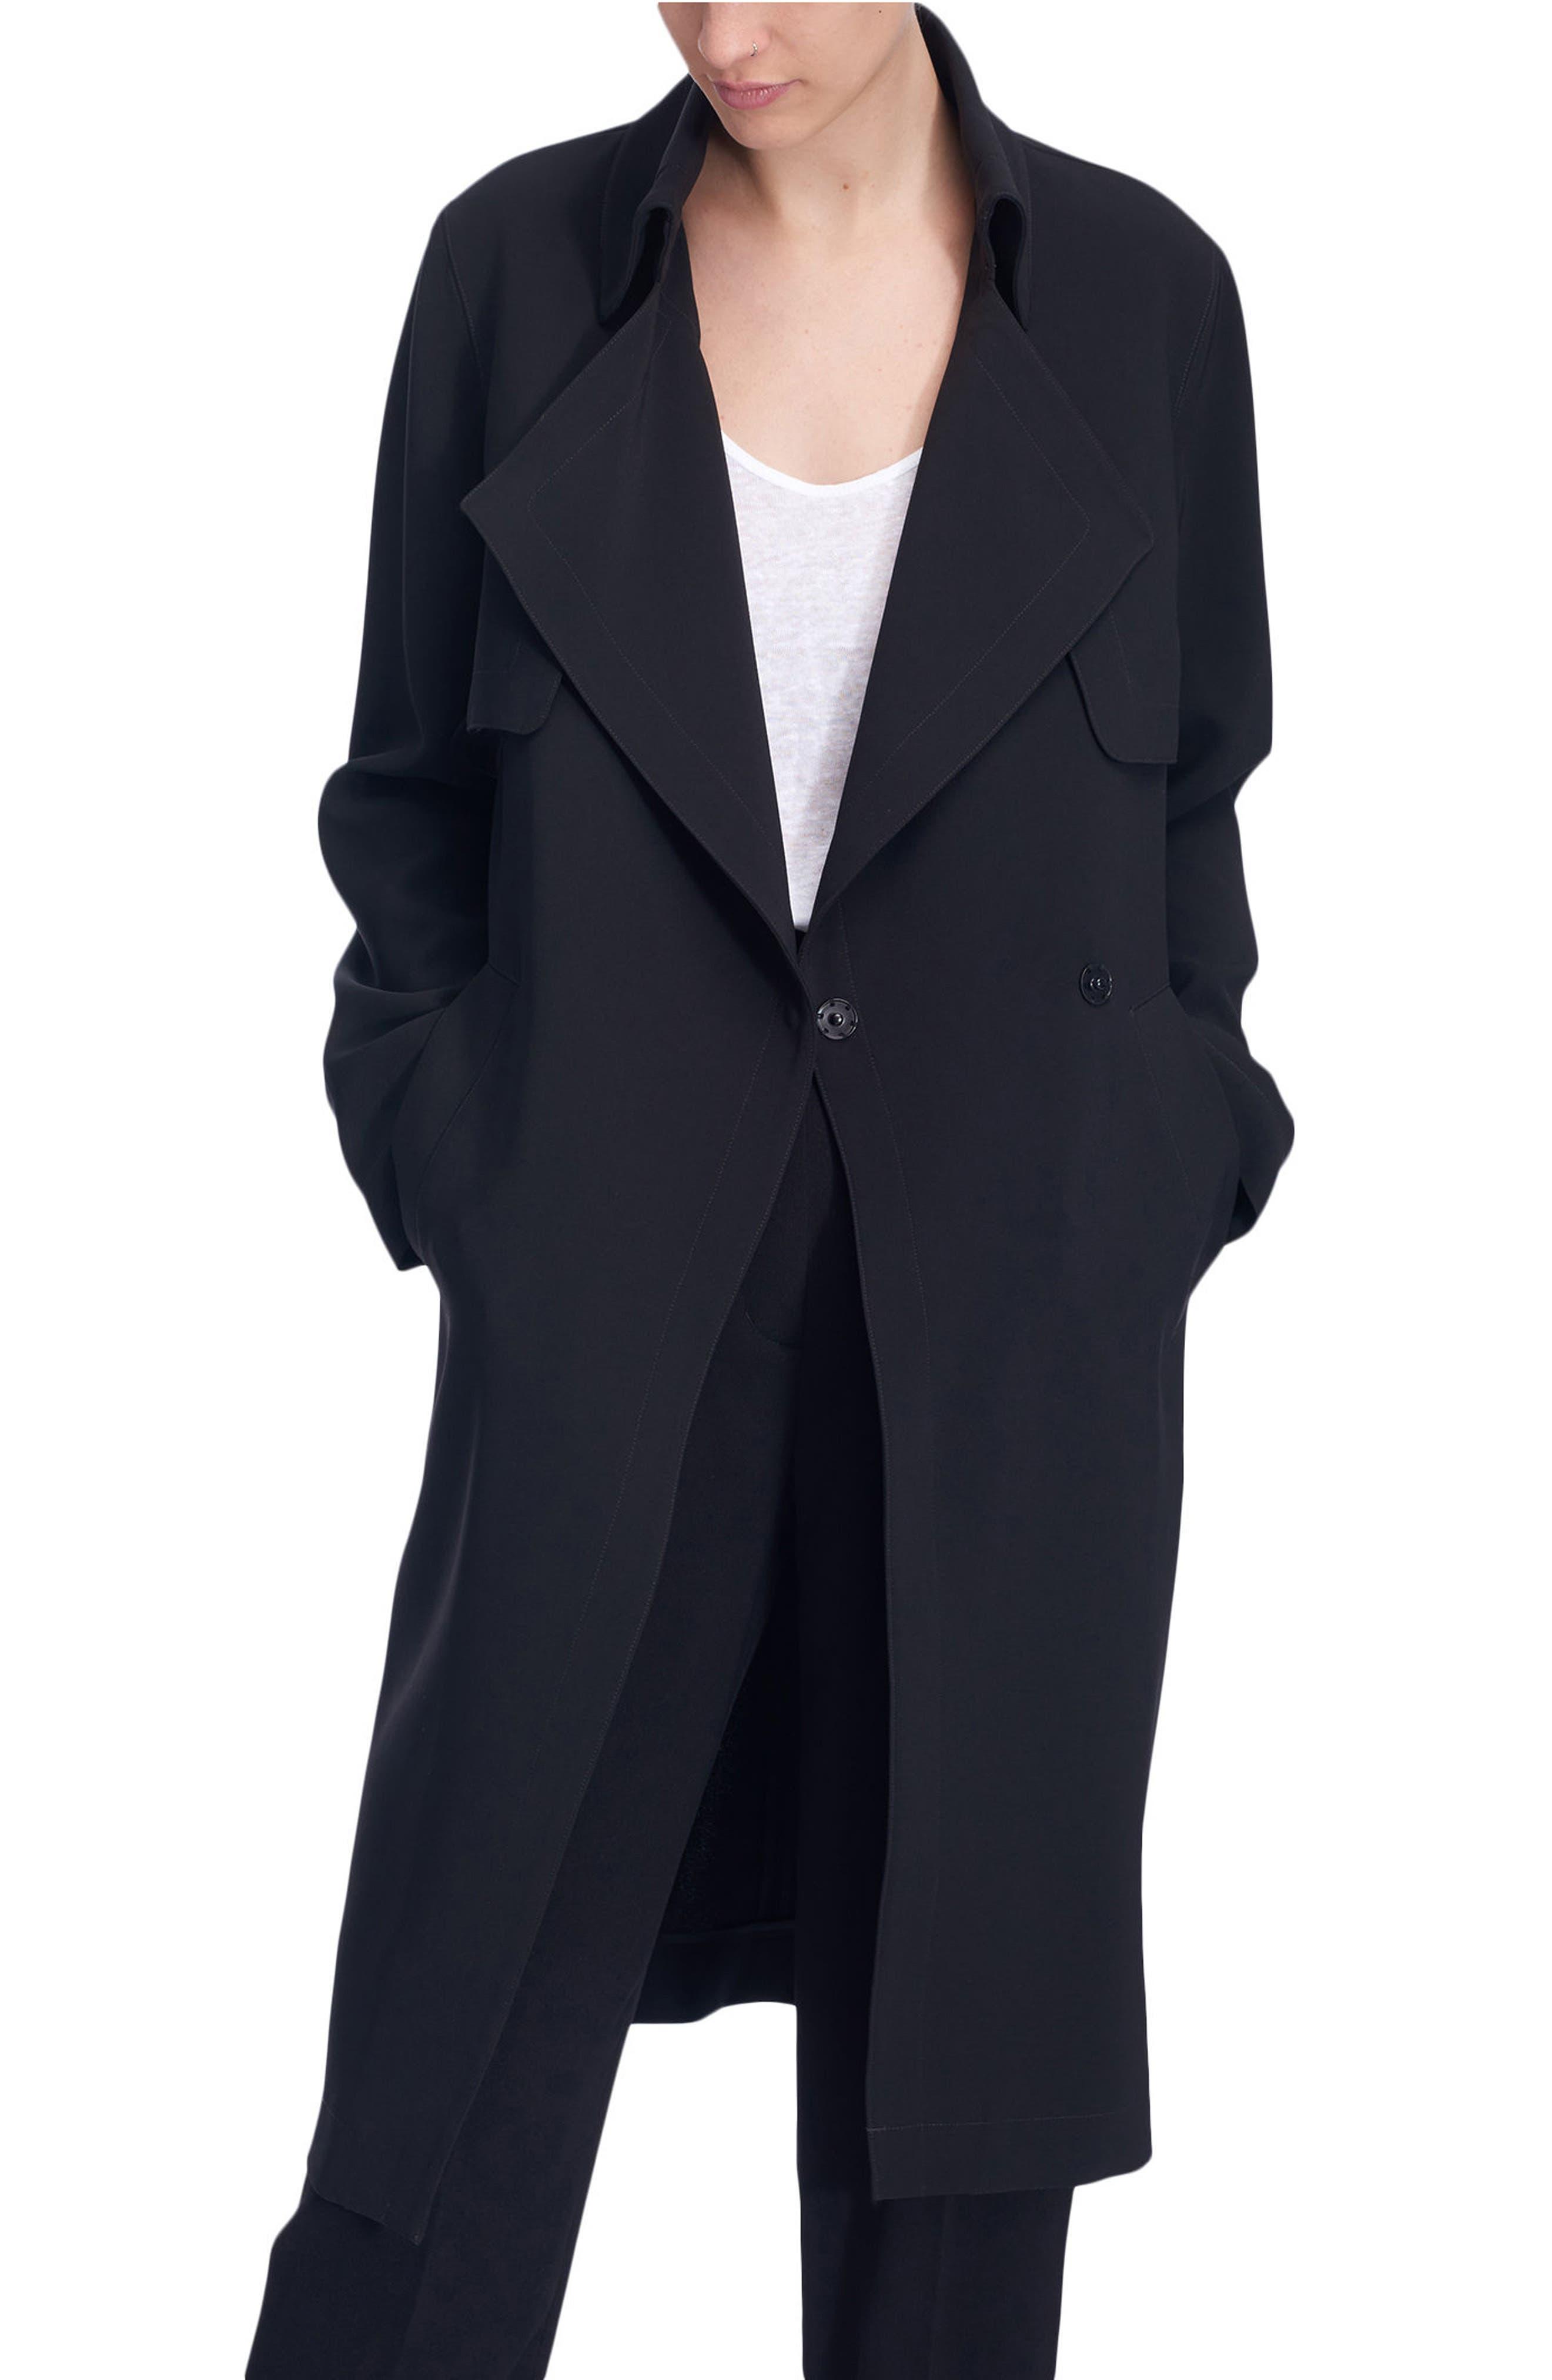 Long Duster Coat,                         Main,                         color, Black